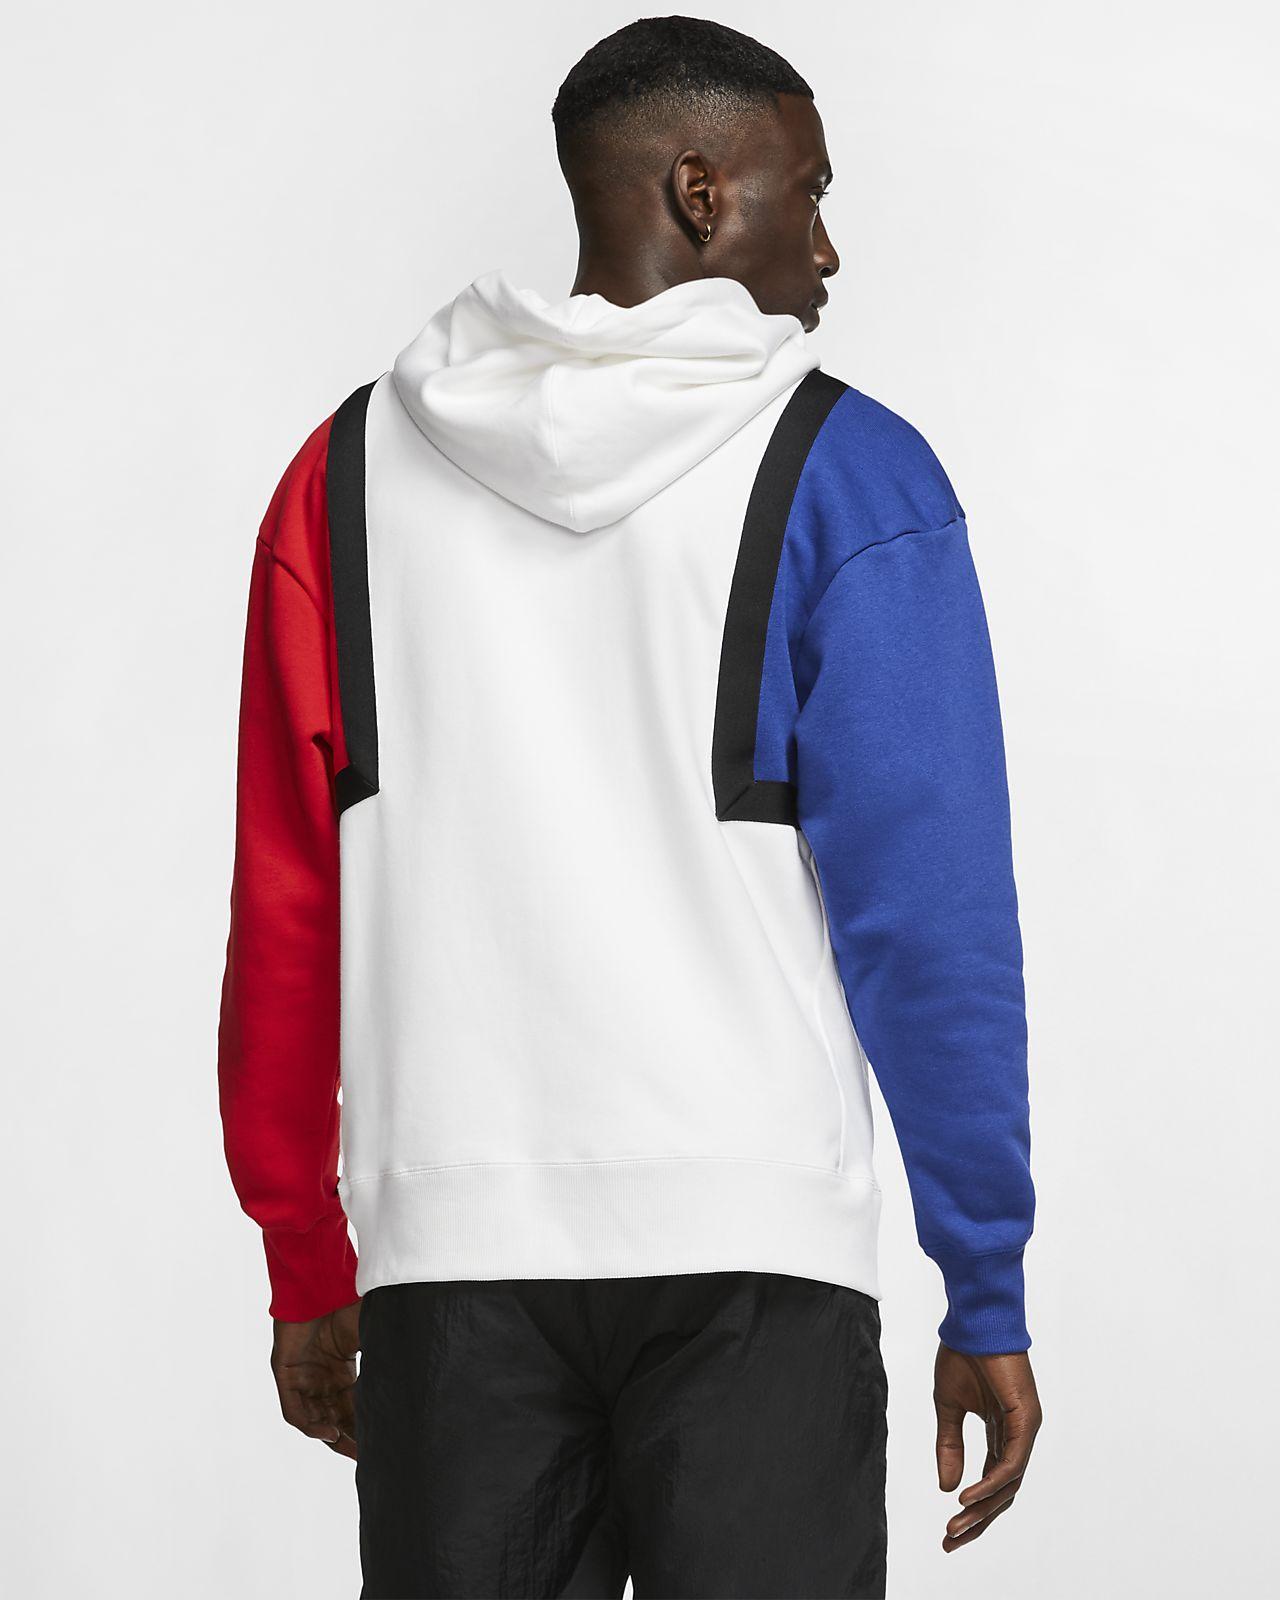 low priced c68b3 79b67 Jordan Sport DNA Men's Pullover Hoodie